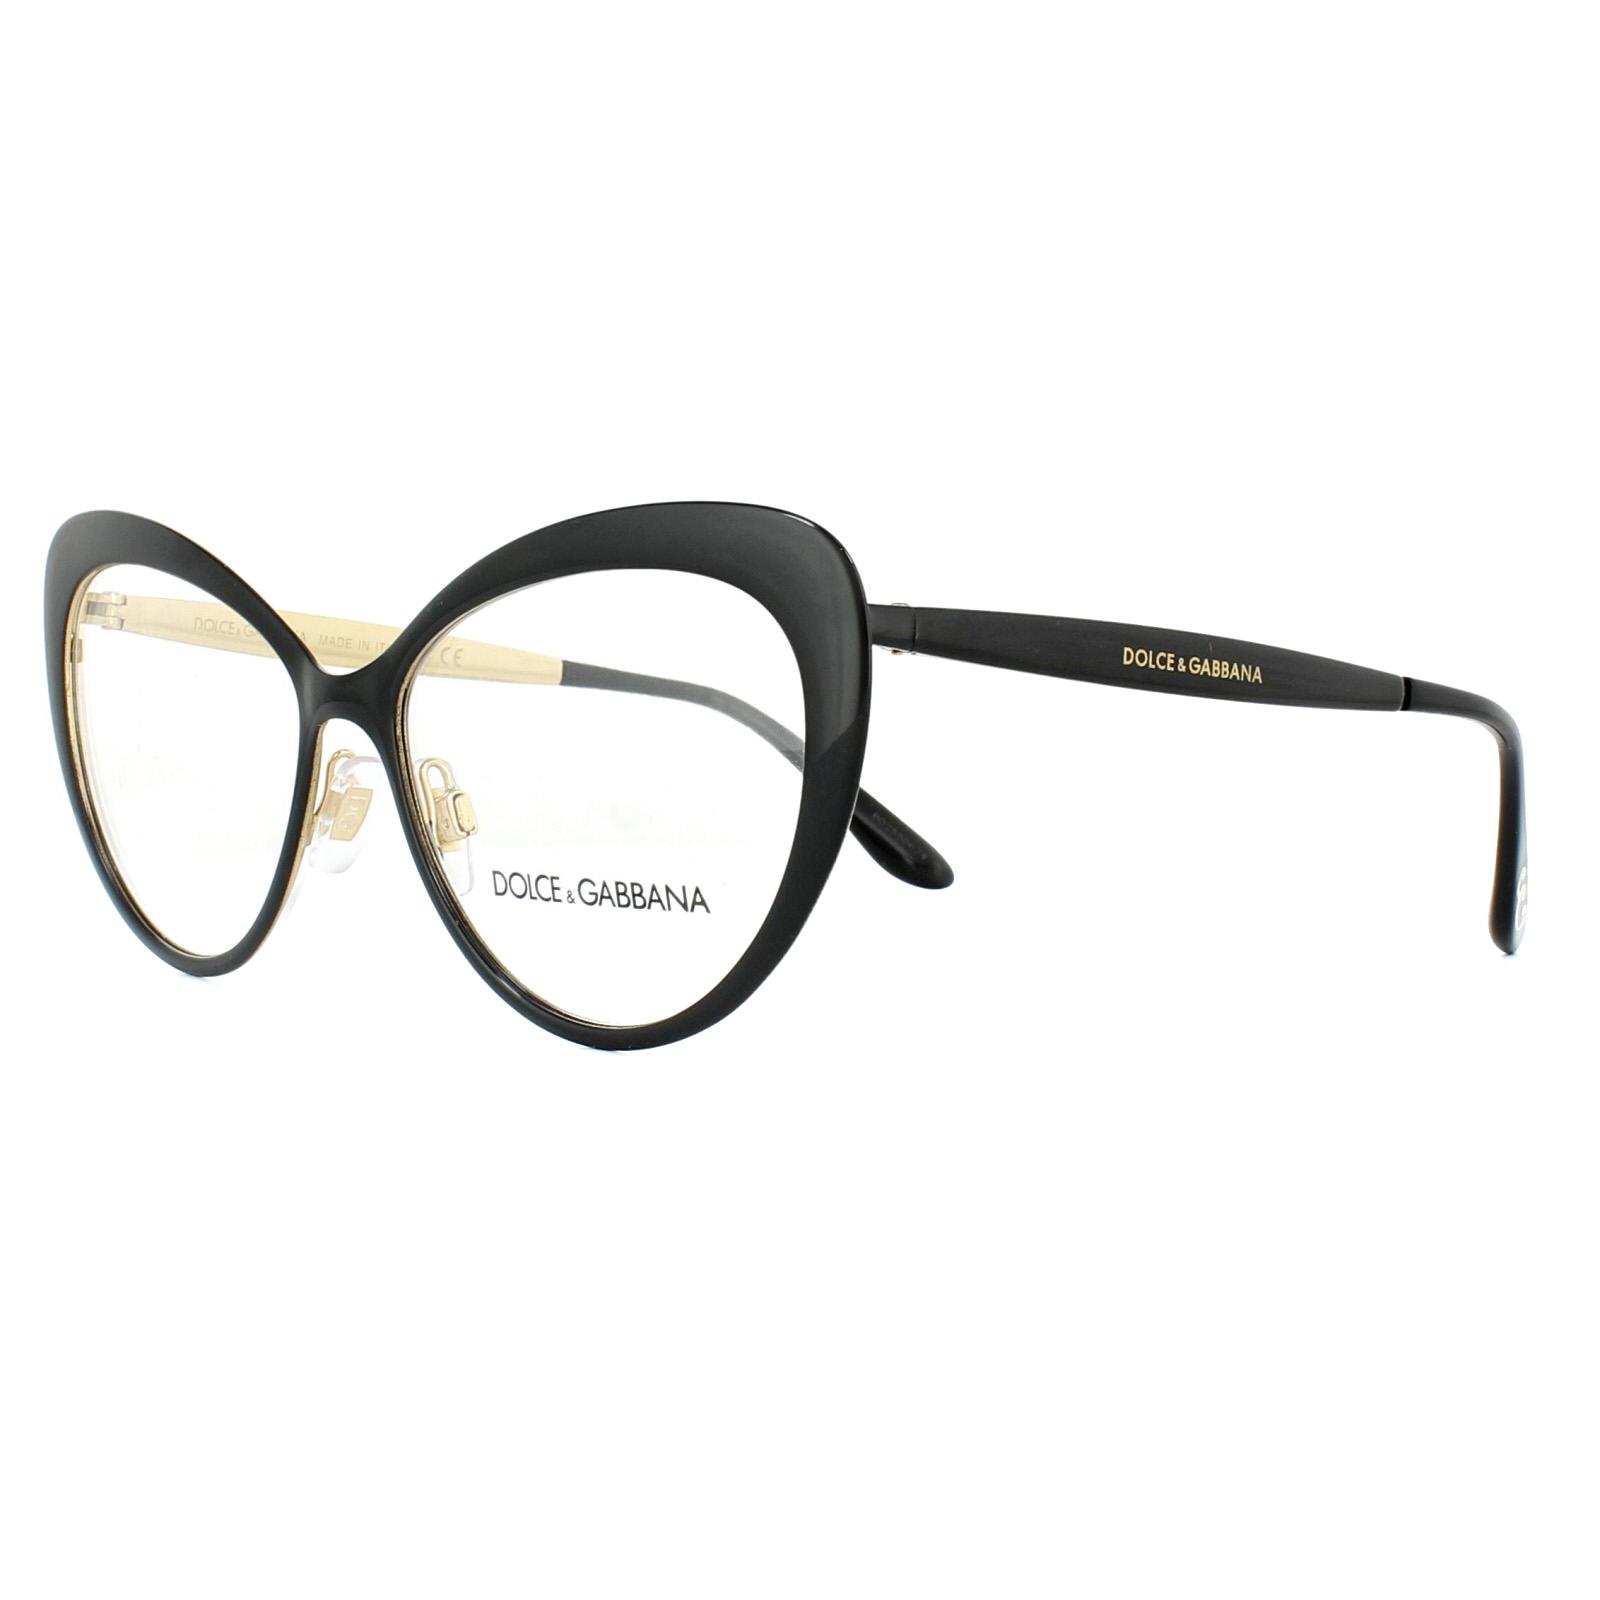 1c885c9f3ee Sentinel Dolce   Gabbana Glasses Frames DG 1294 01 Black Gold 54mm Womens.  Sentinel Thumbnail 2